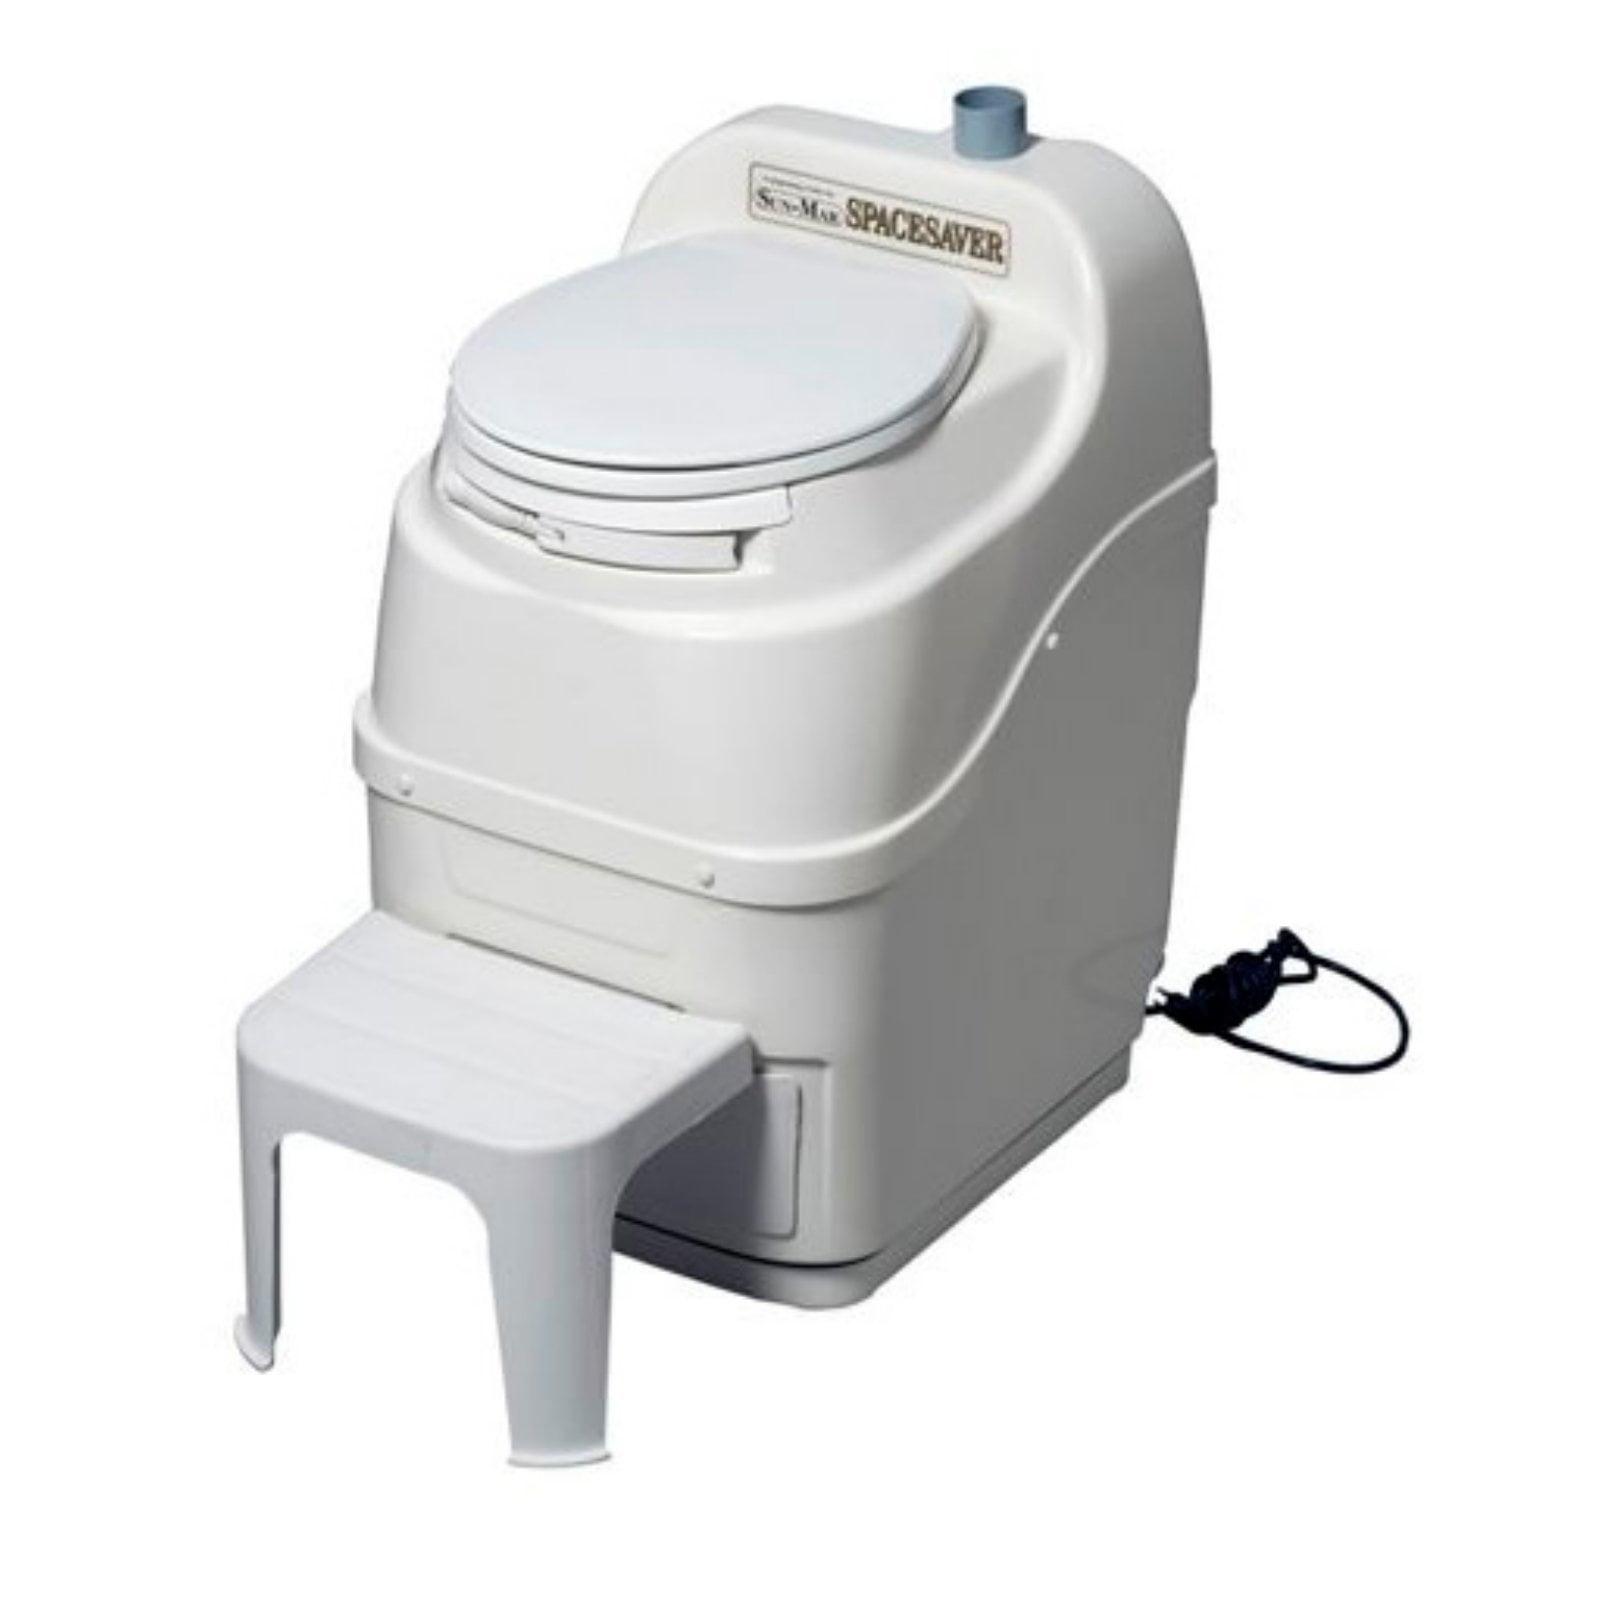 Sun-Mar SpaceSaver Electric Waterless Composting Toilet